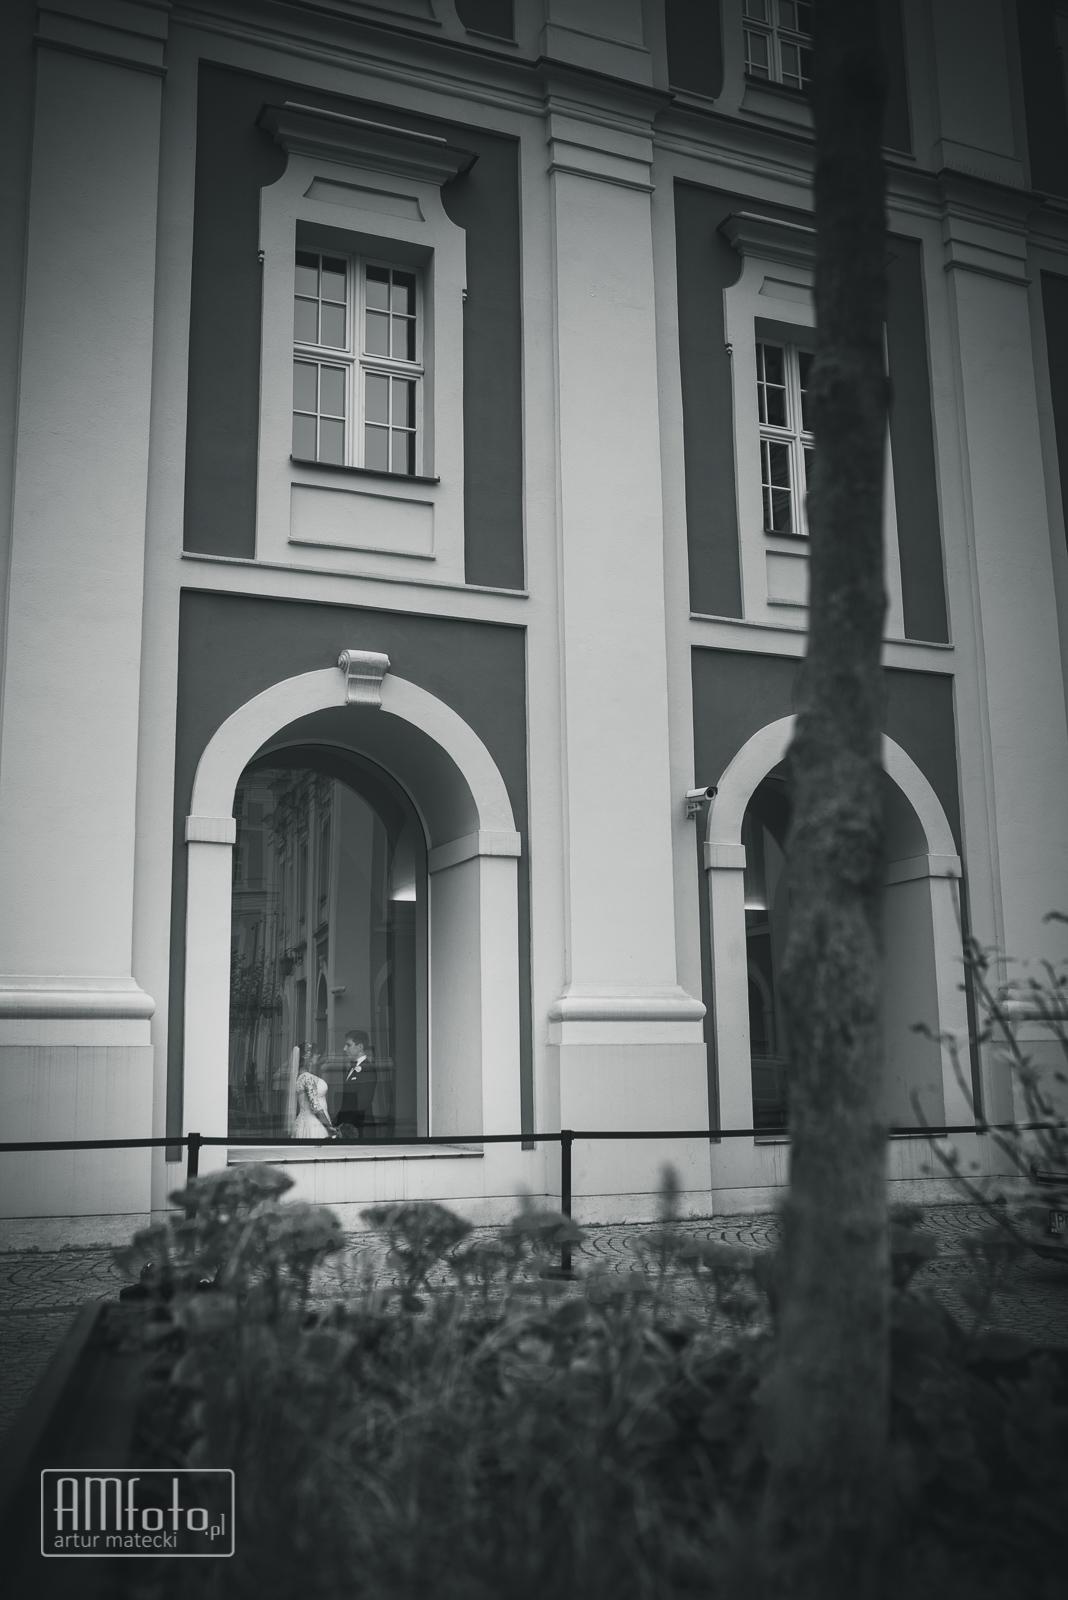 0241_Ilona&Marek_sesja_poslubna_plener_slubny_poznan____www-amfoto-pl__AMF_4057.jpg